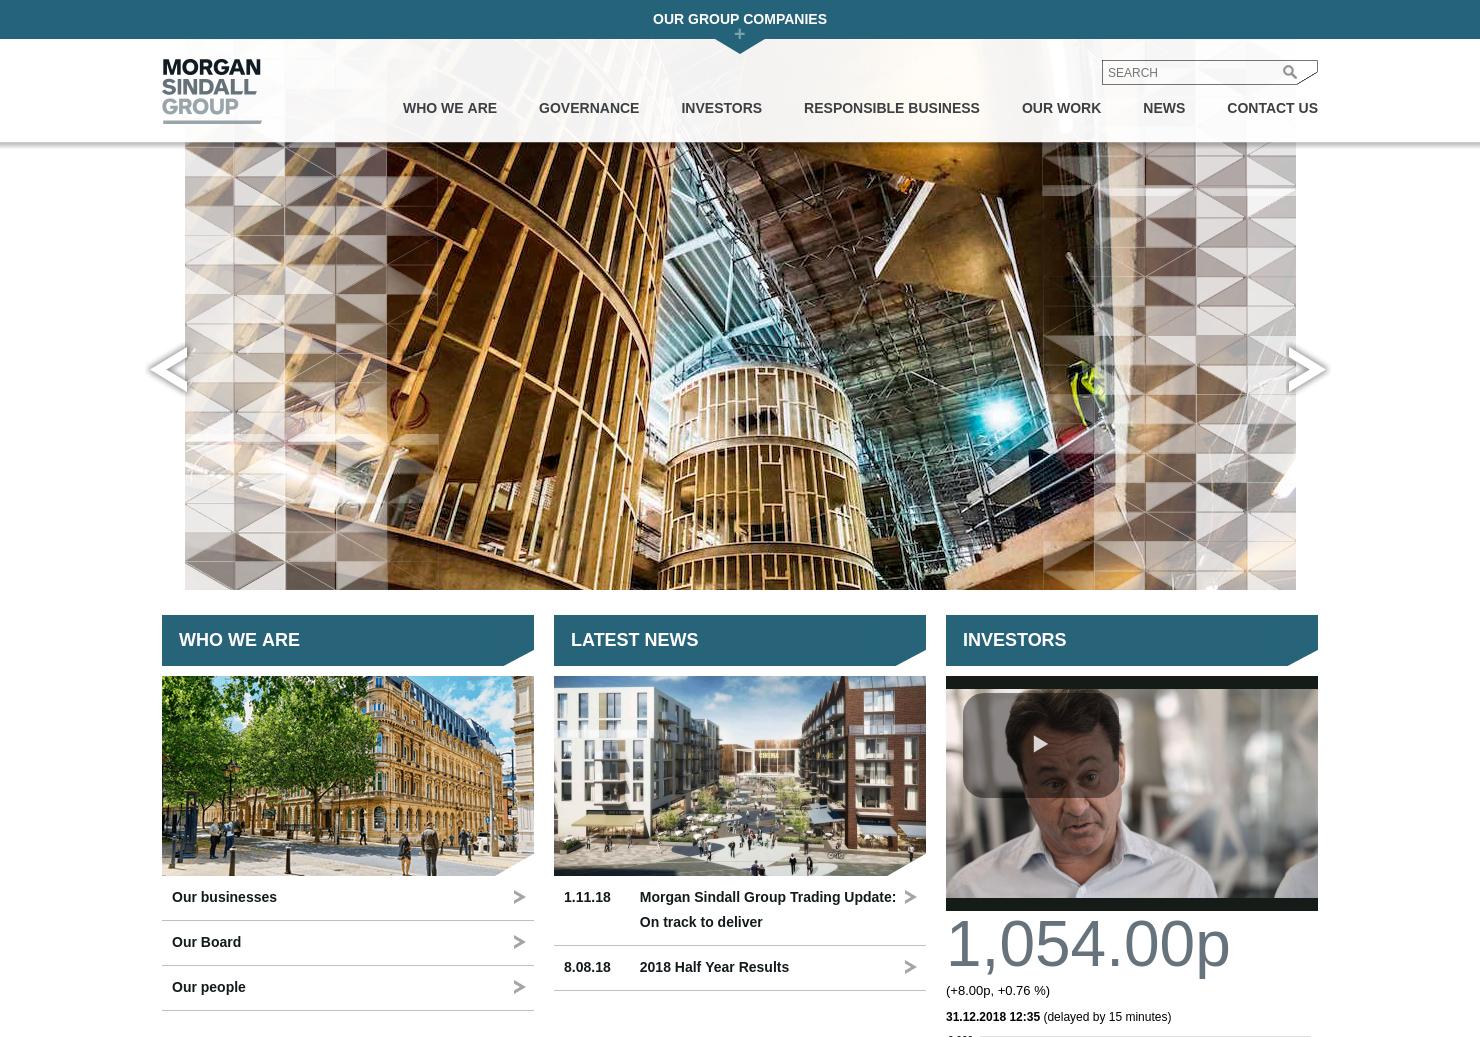 Morgan Sindall Group Home Page